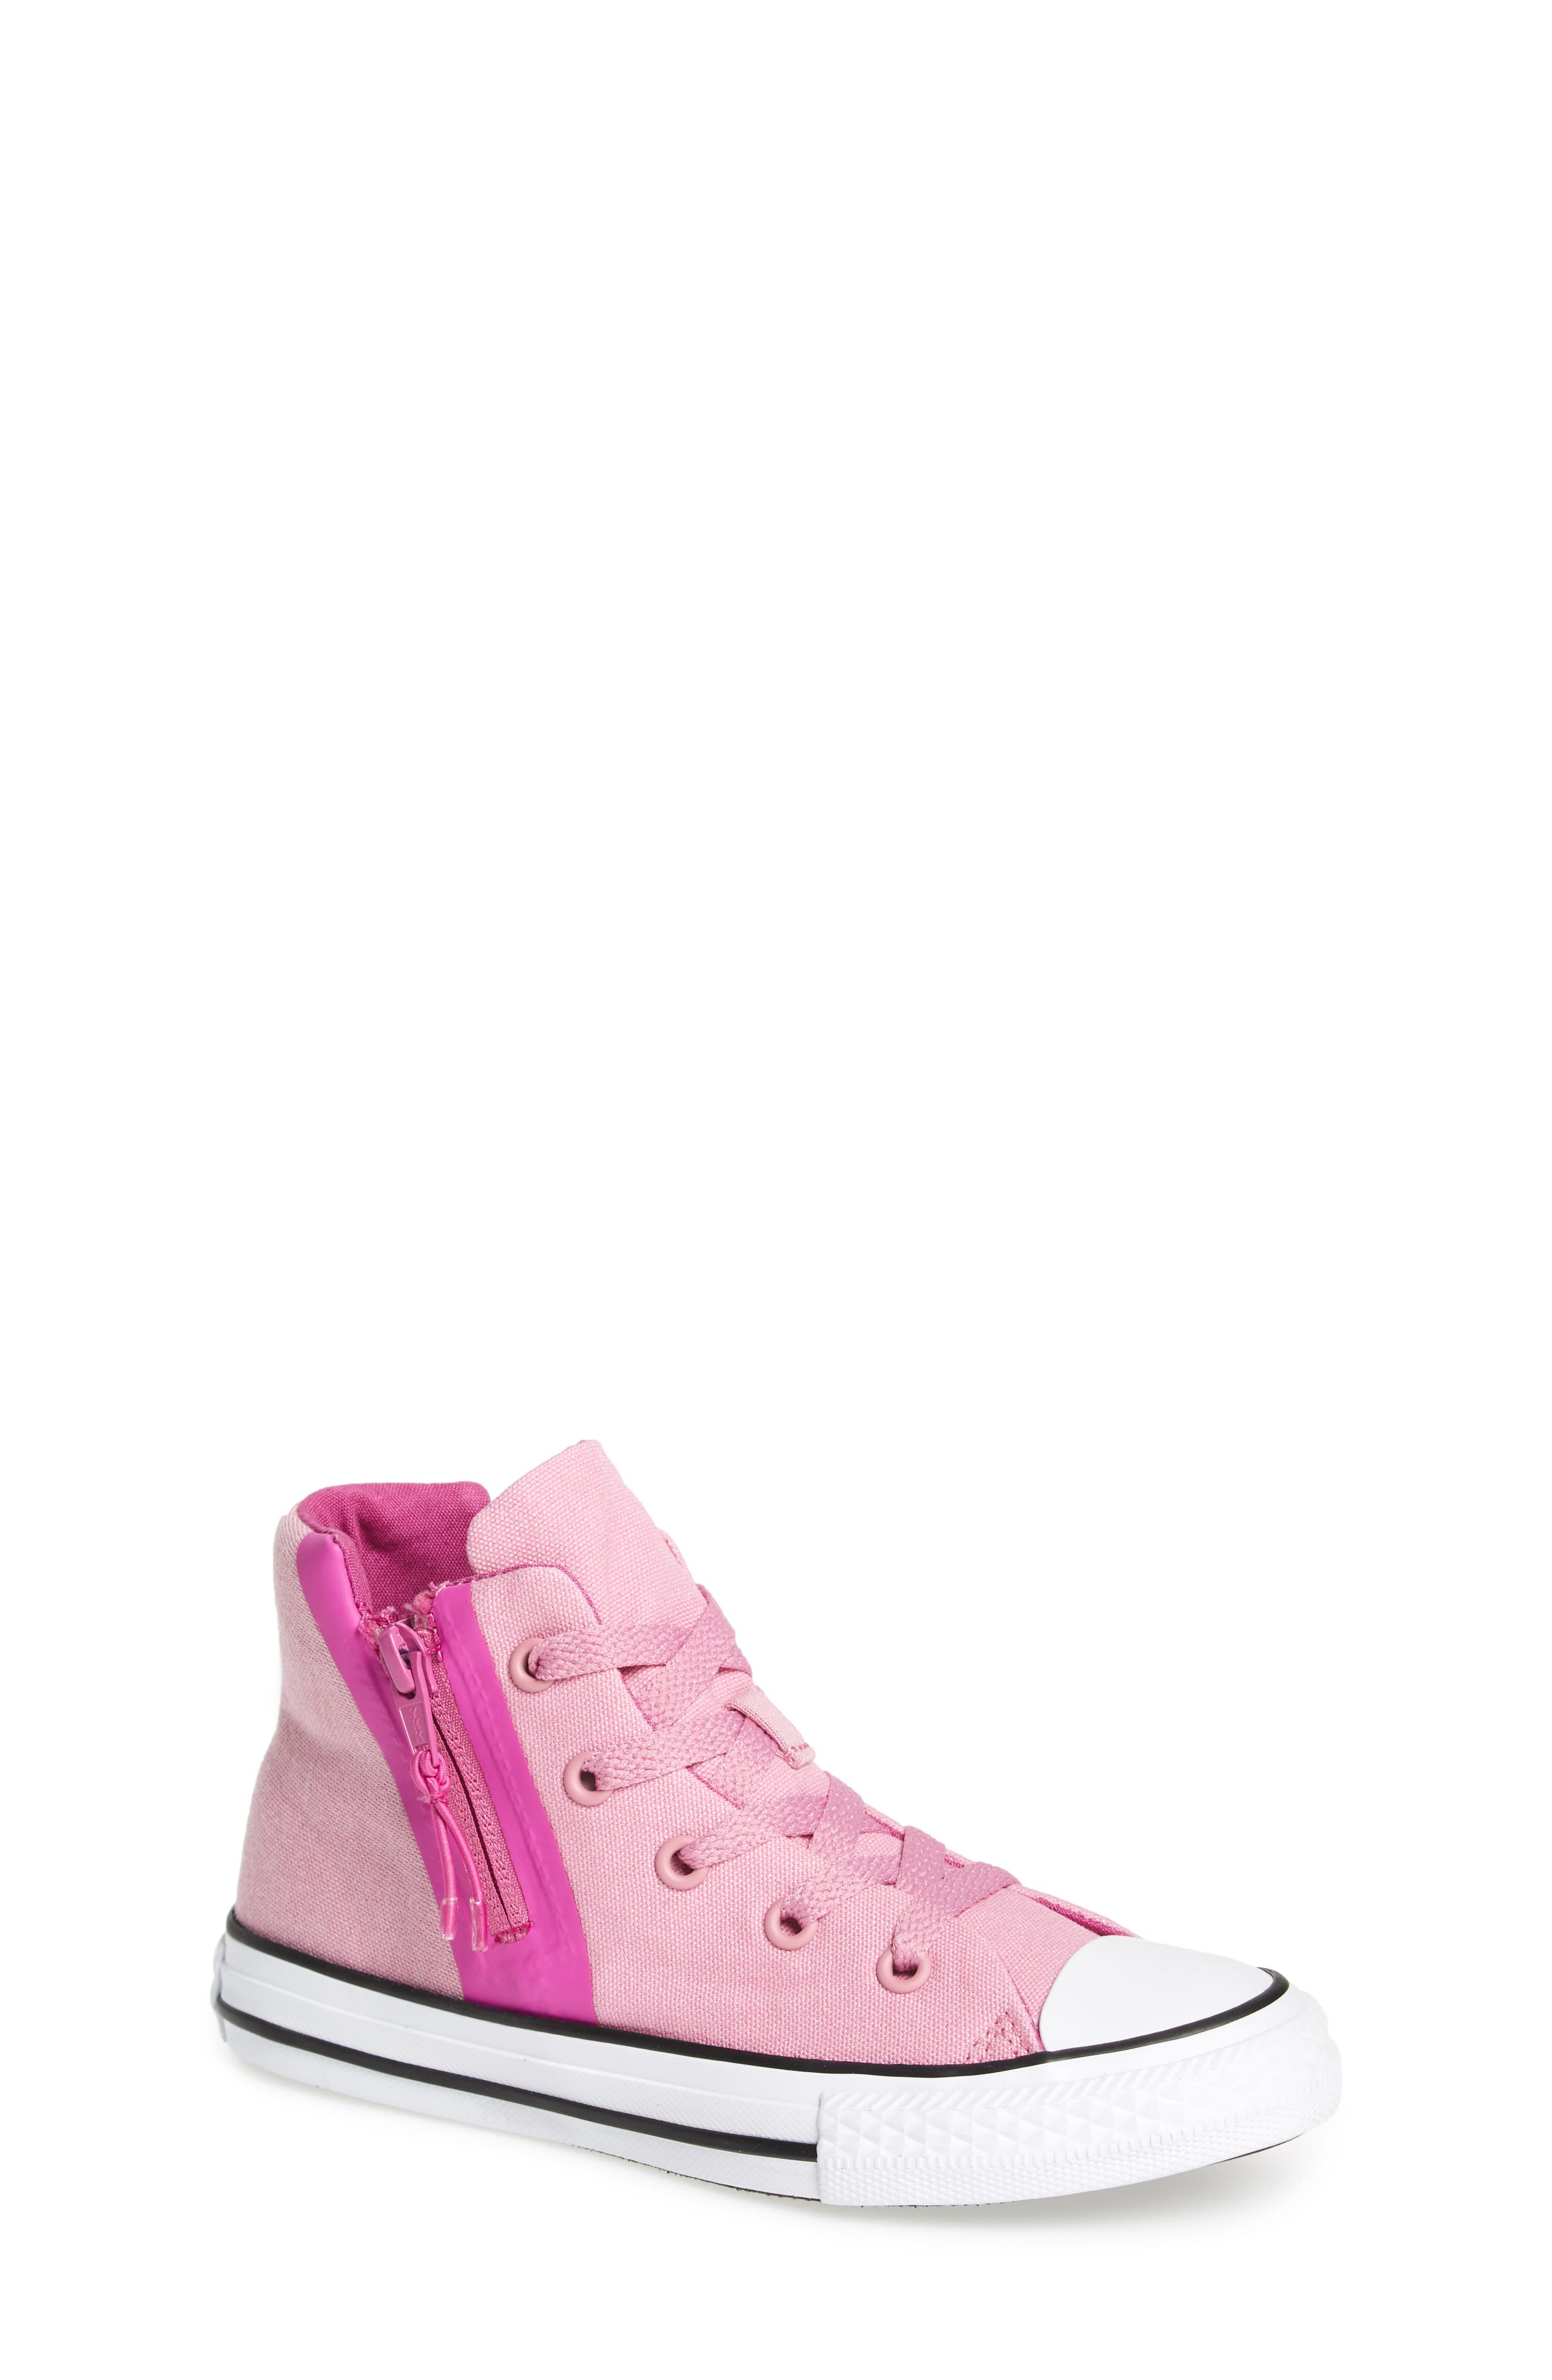 Alternate Image 1 Selected - Converse Chuck Taylor® All Star® Sport Zip High Top Sneaker (Toddler, Little Kid & Big Kid)